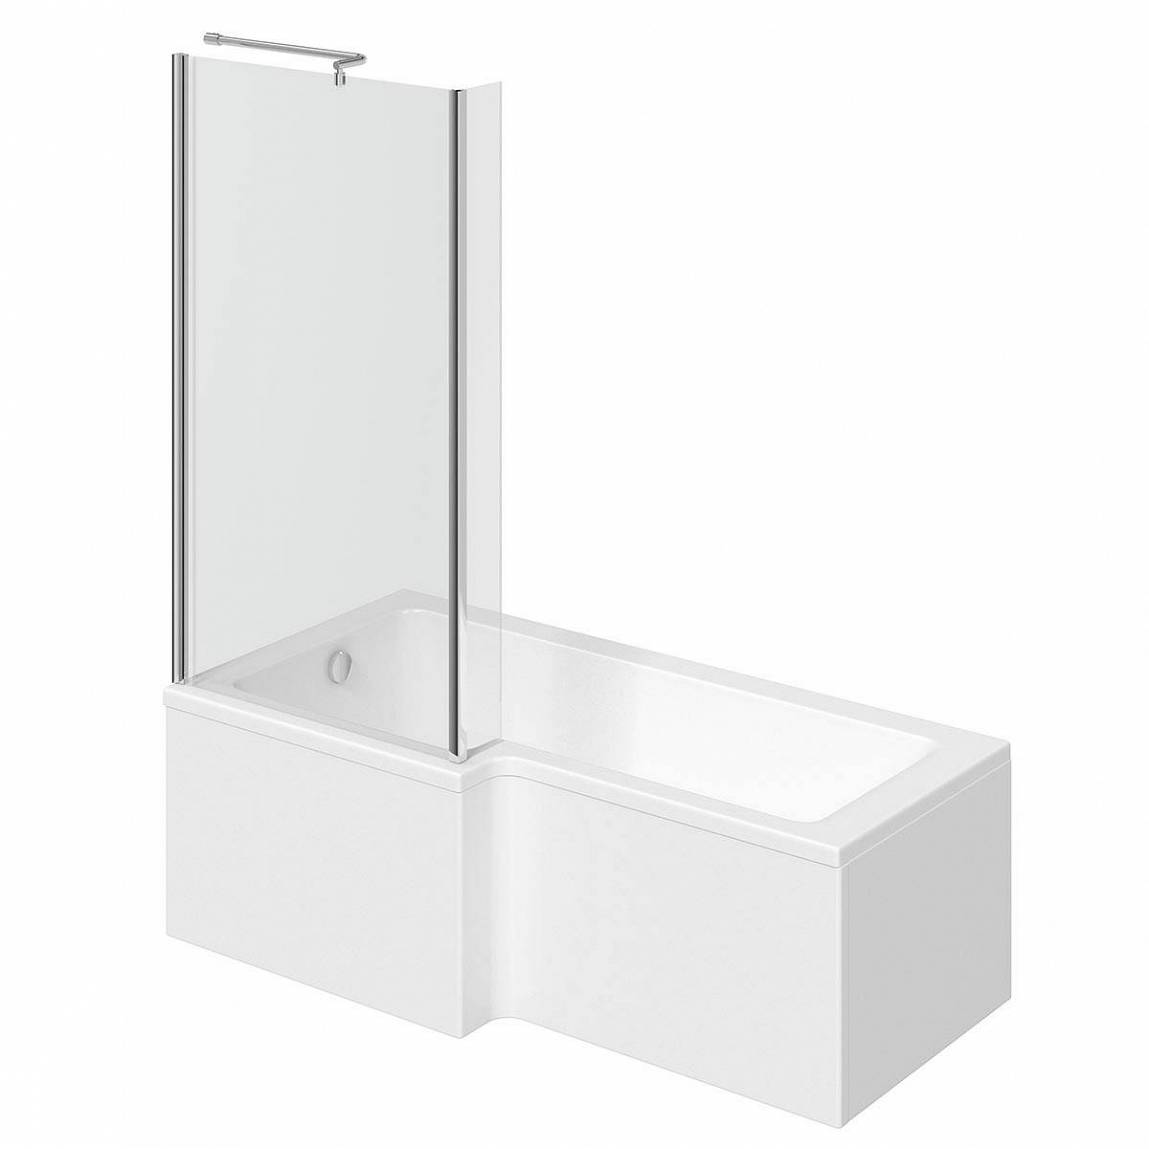 Image of Boston Shower Bath 1700 x 850 LH inc. Screen